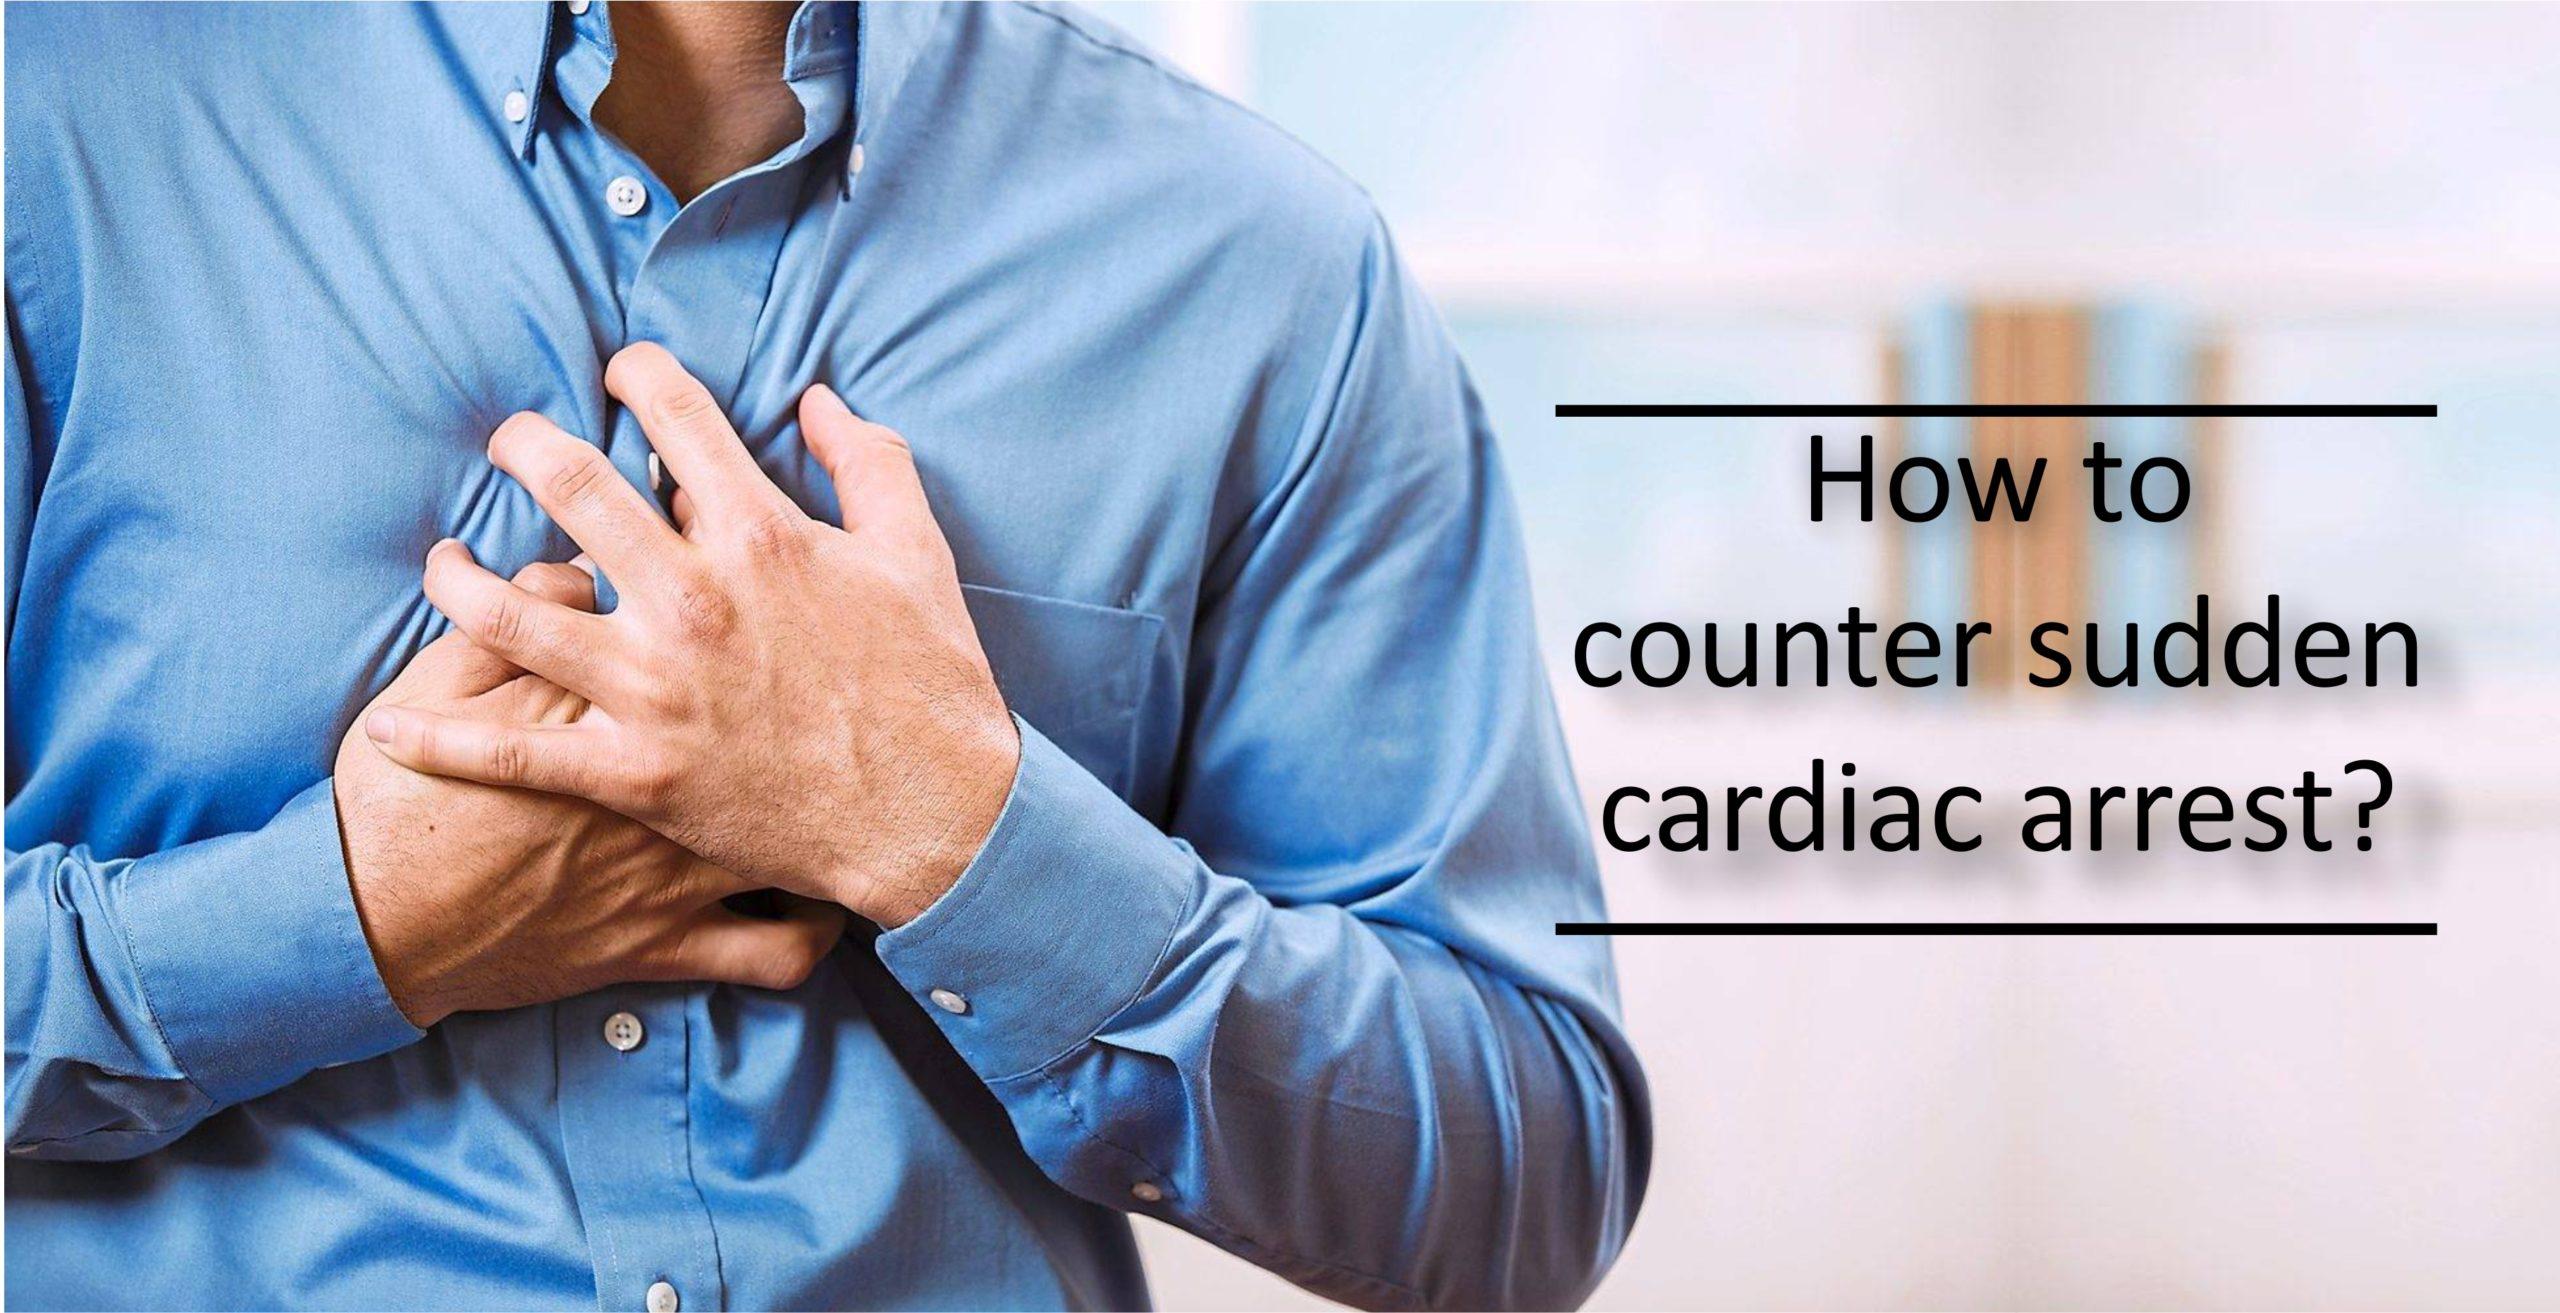 How to Counter a Sudden Cardiac Arrest?